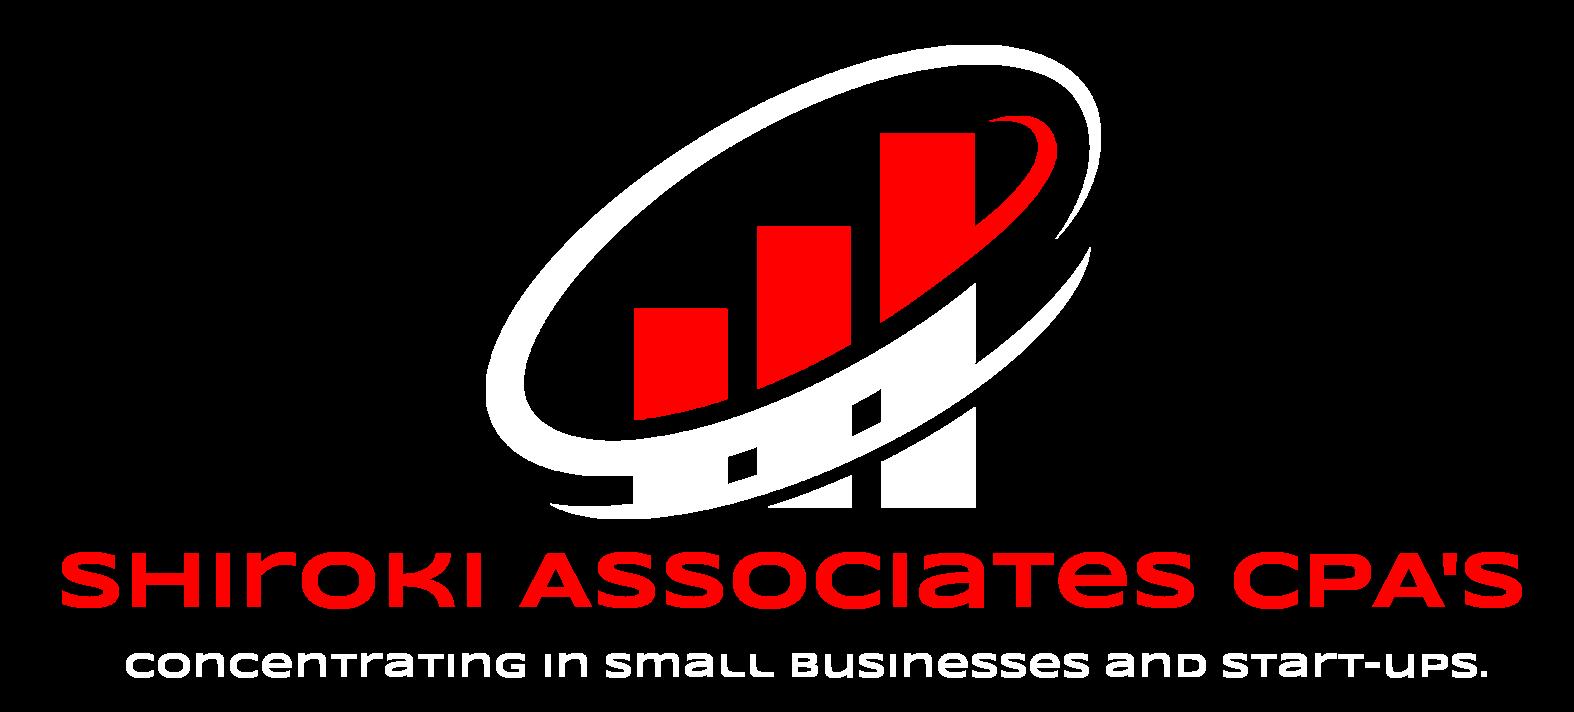 Shiroki Associates CPA's